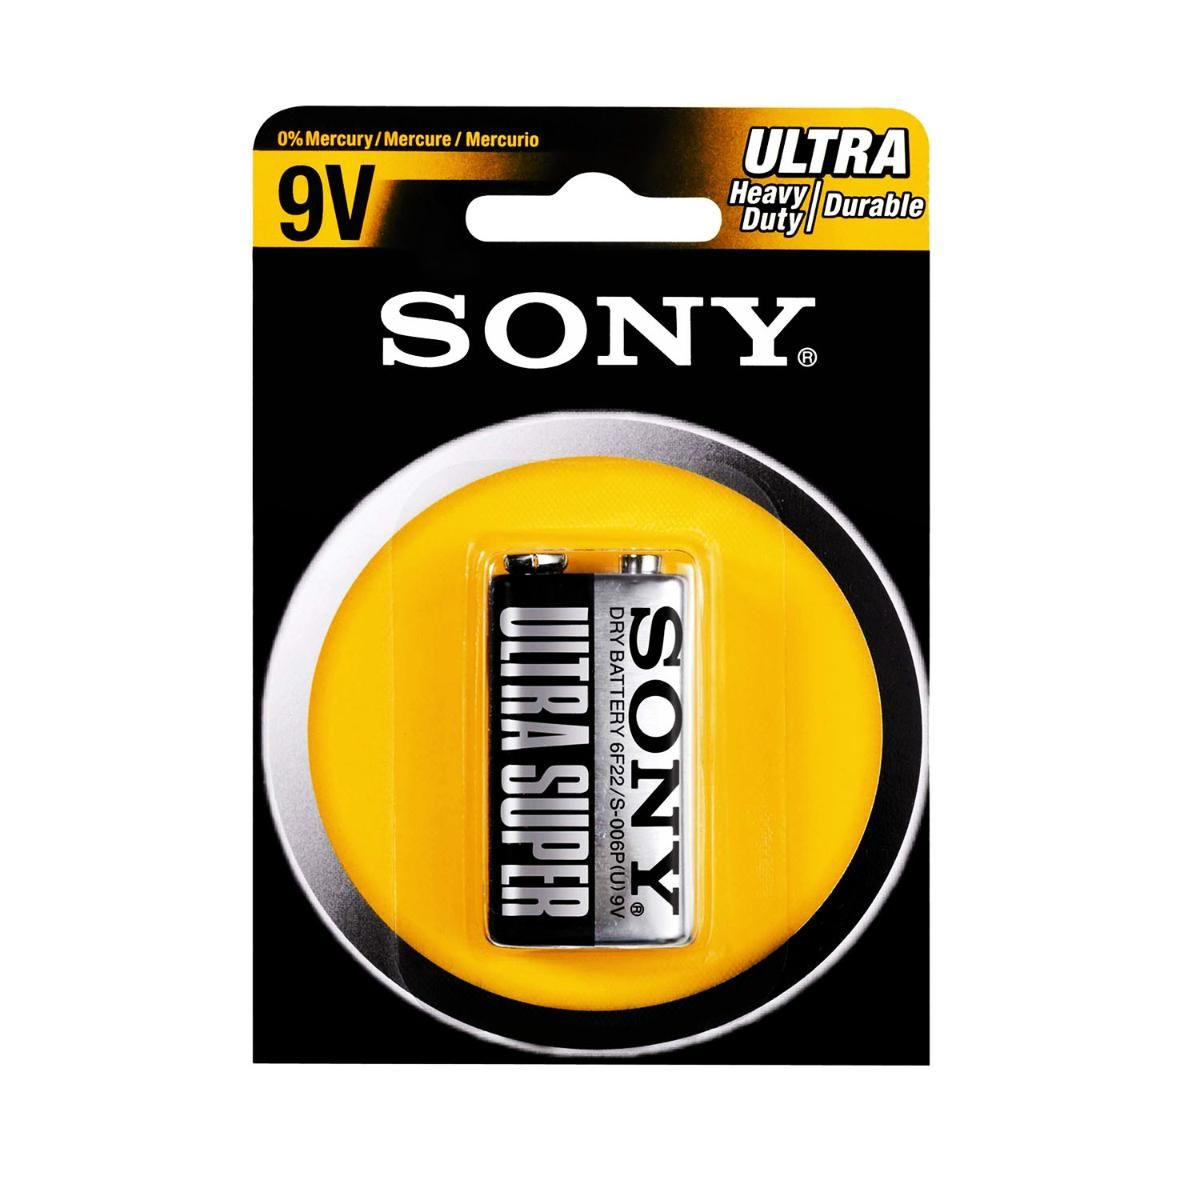 Bateria Sony de Zinco Carbono 9V S-006P-B1A ULTRA Heavy Duty